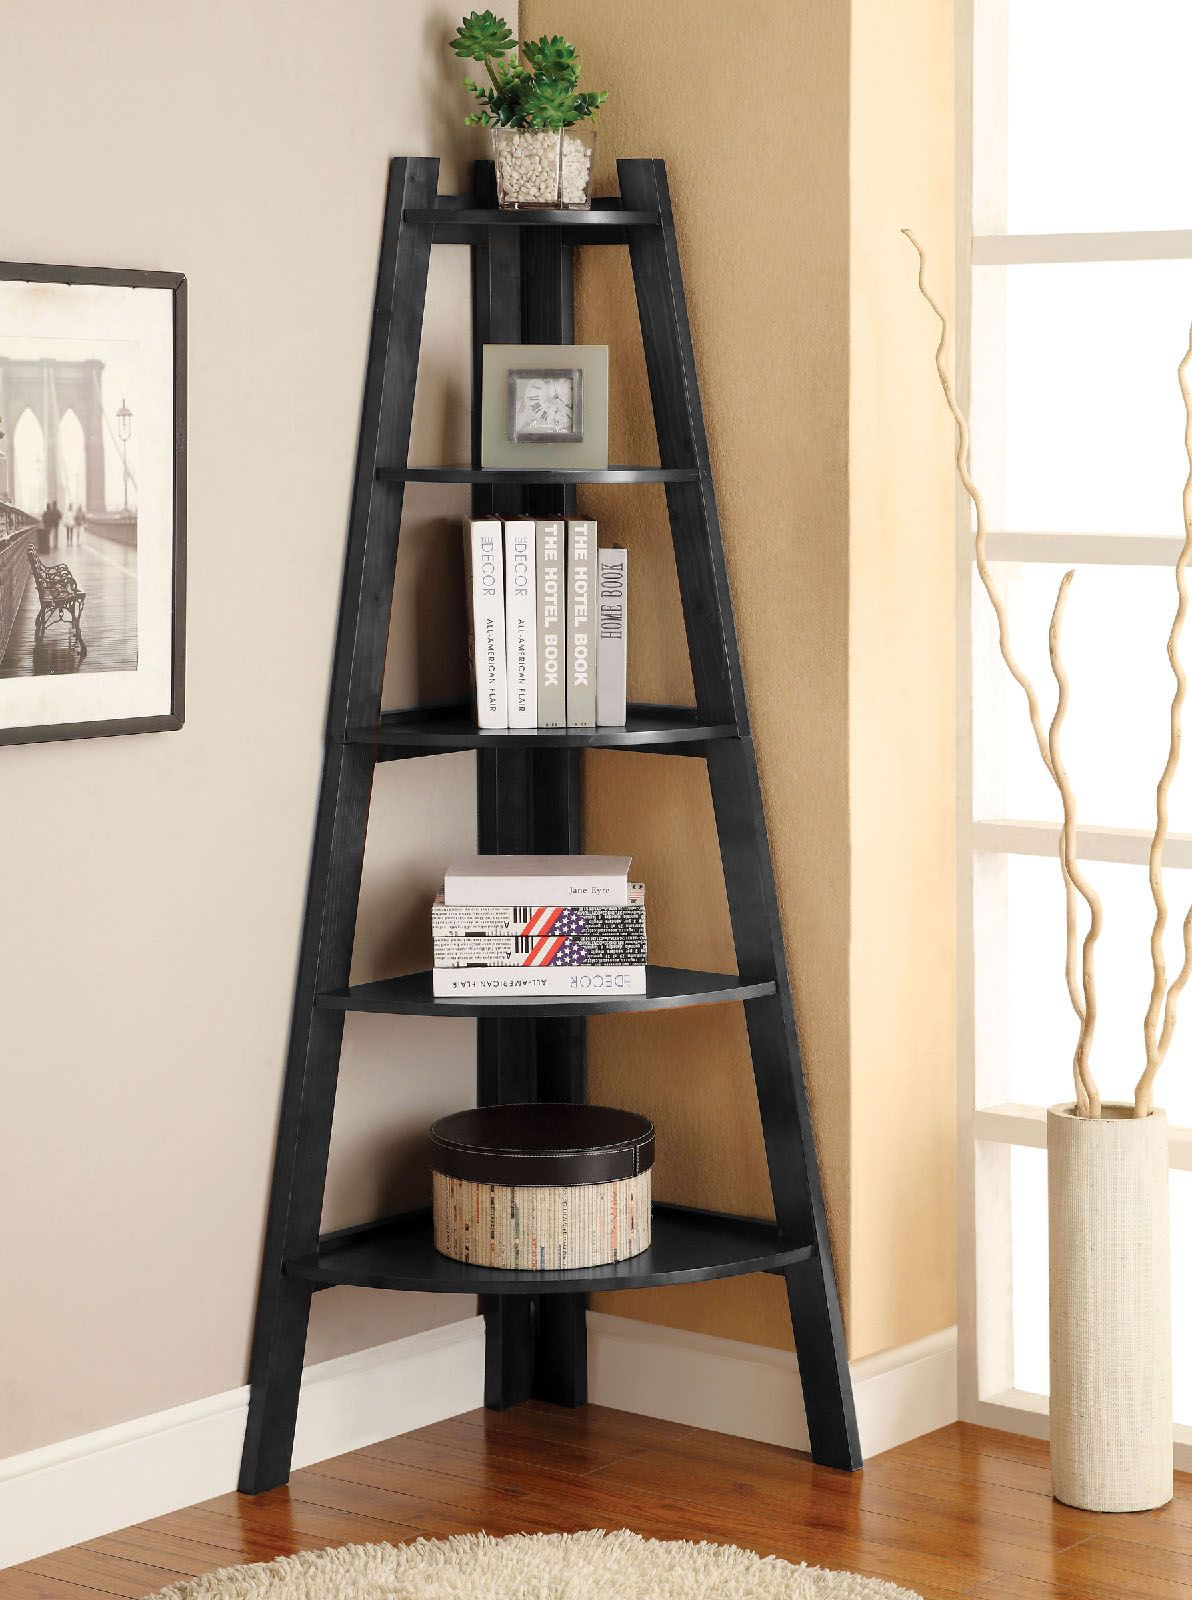 Furniture Of America CM AC6214BK Contemporary Corner 5 Tier Ladder Shelf Bookcase In Black Finish